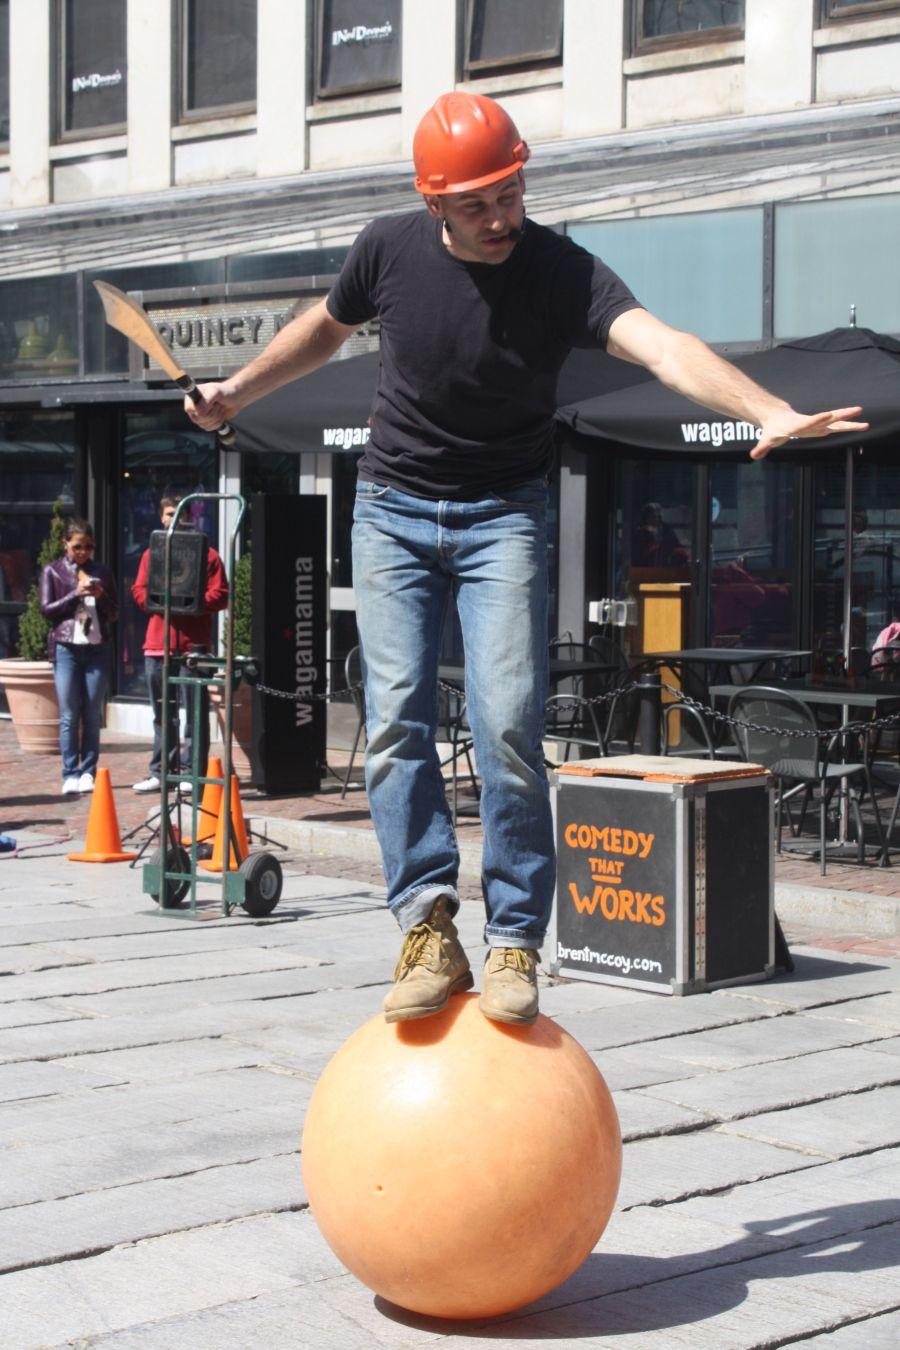 boston faneuil hall brett mccoy real mccoy comedy that works street performer 3